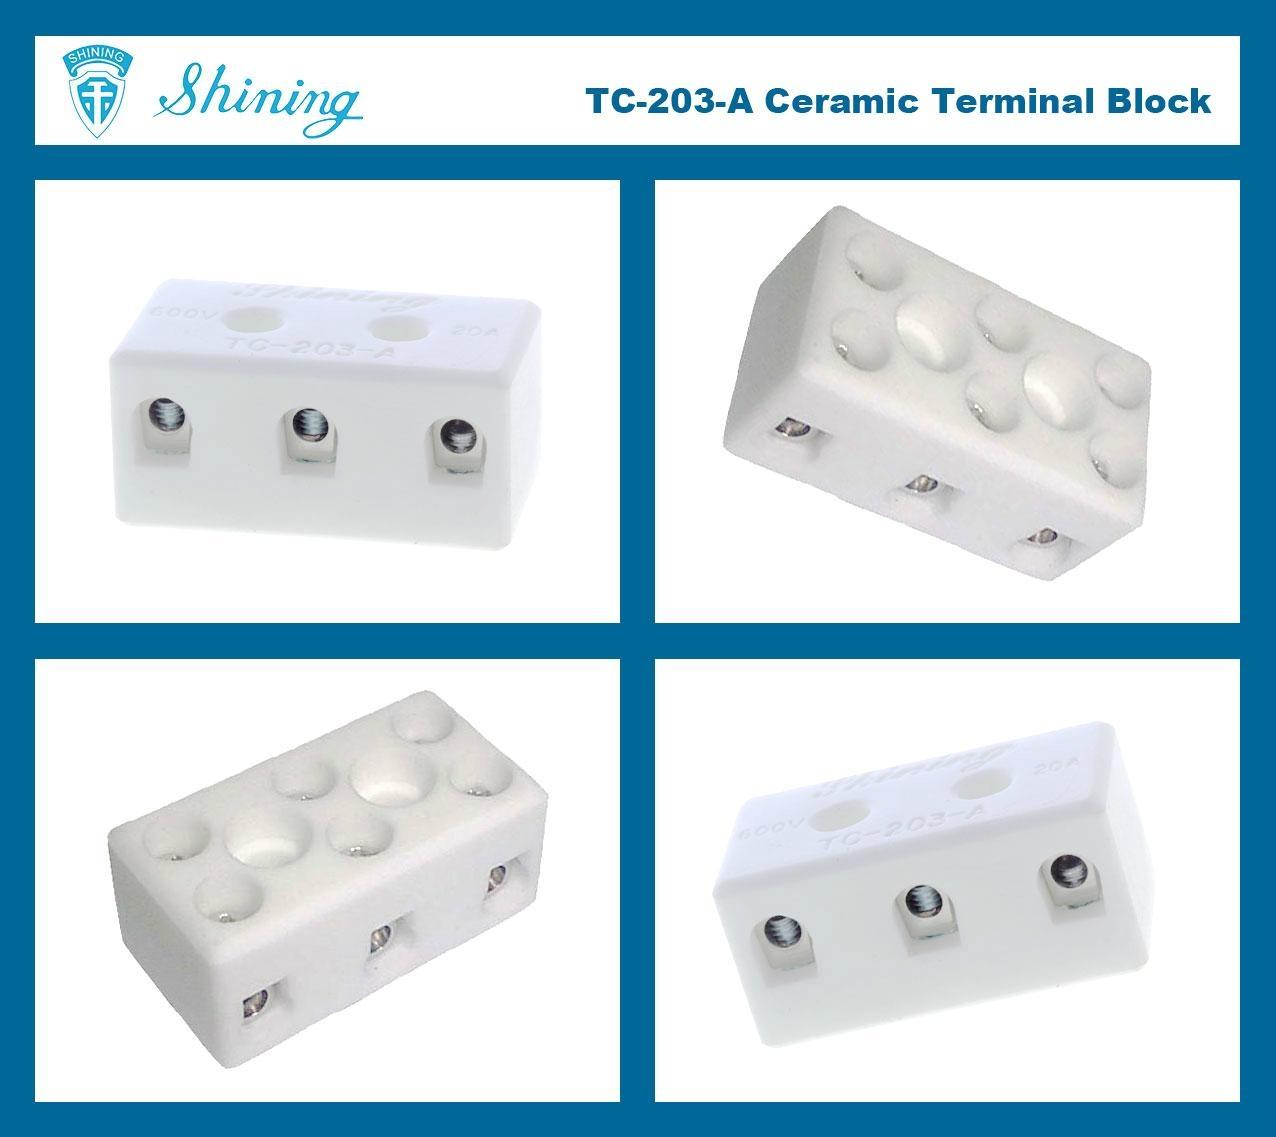 TC-203-A 陶瓷端子台 Ceramic Terminal Block 7